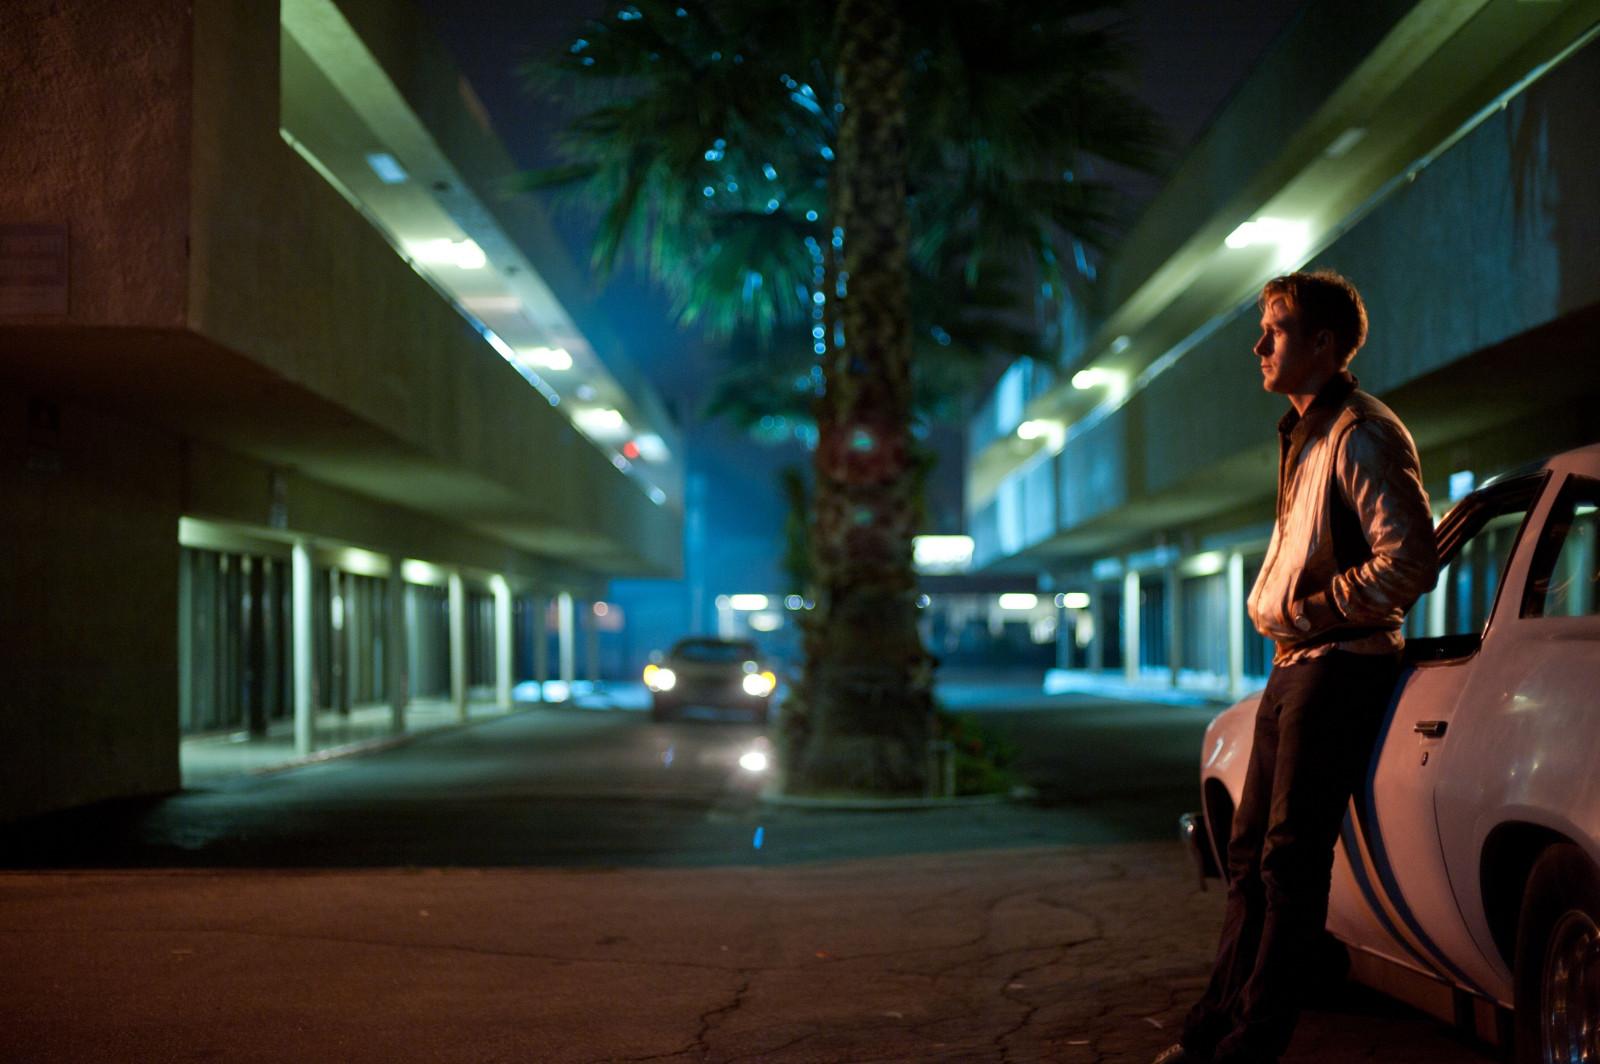 wallpaper night movies evening ryan gosling drive